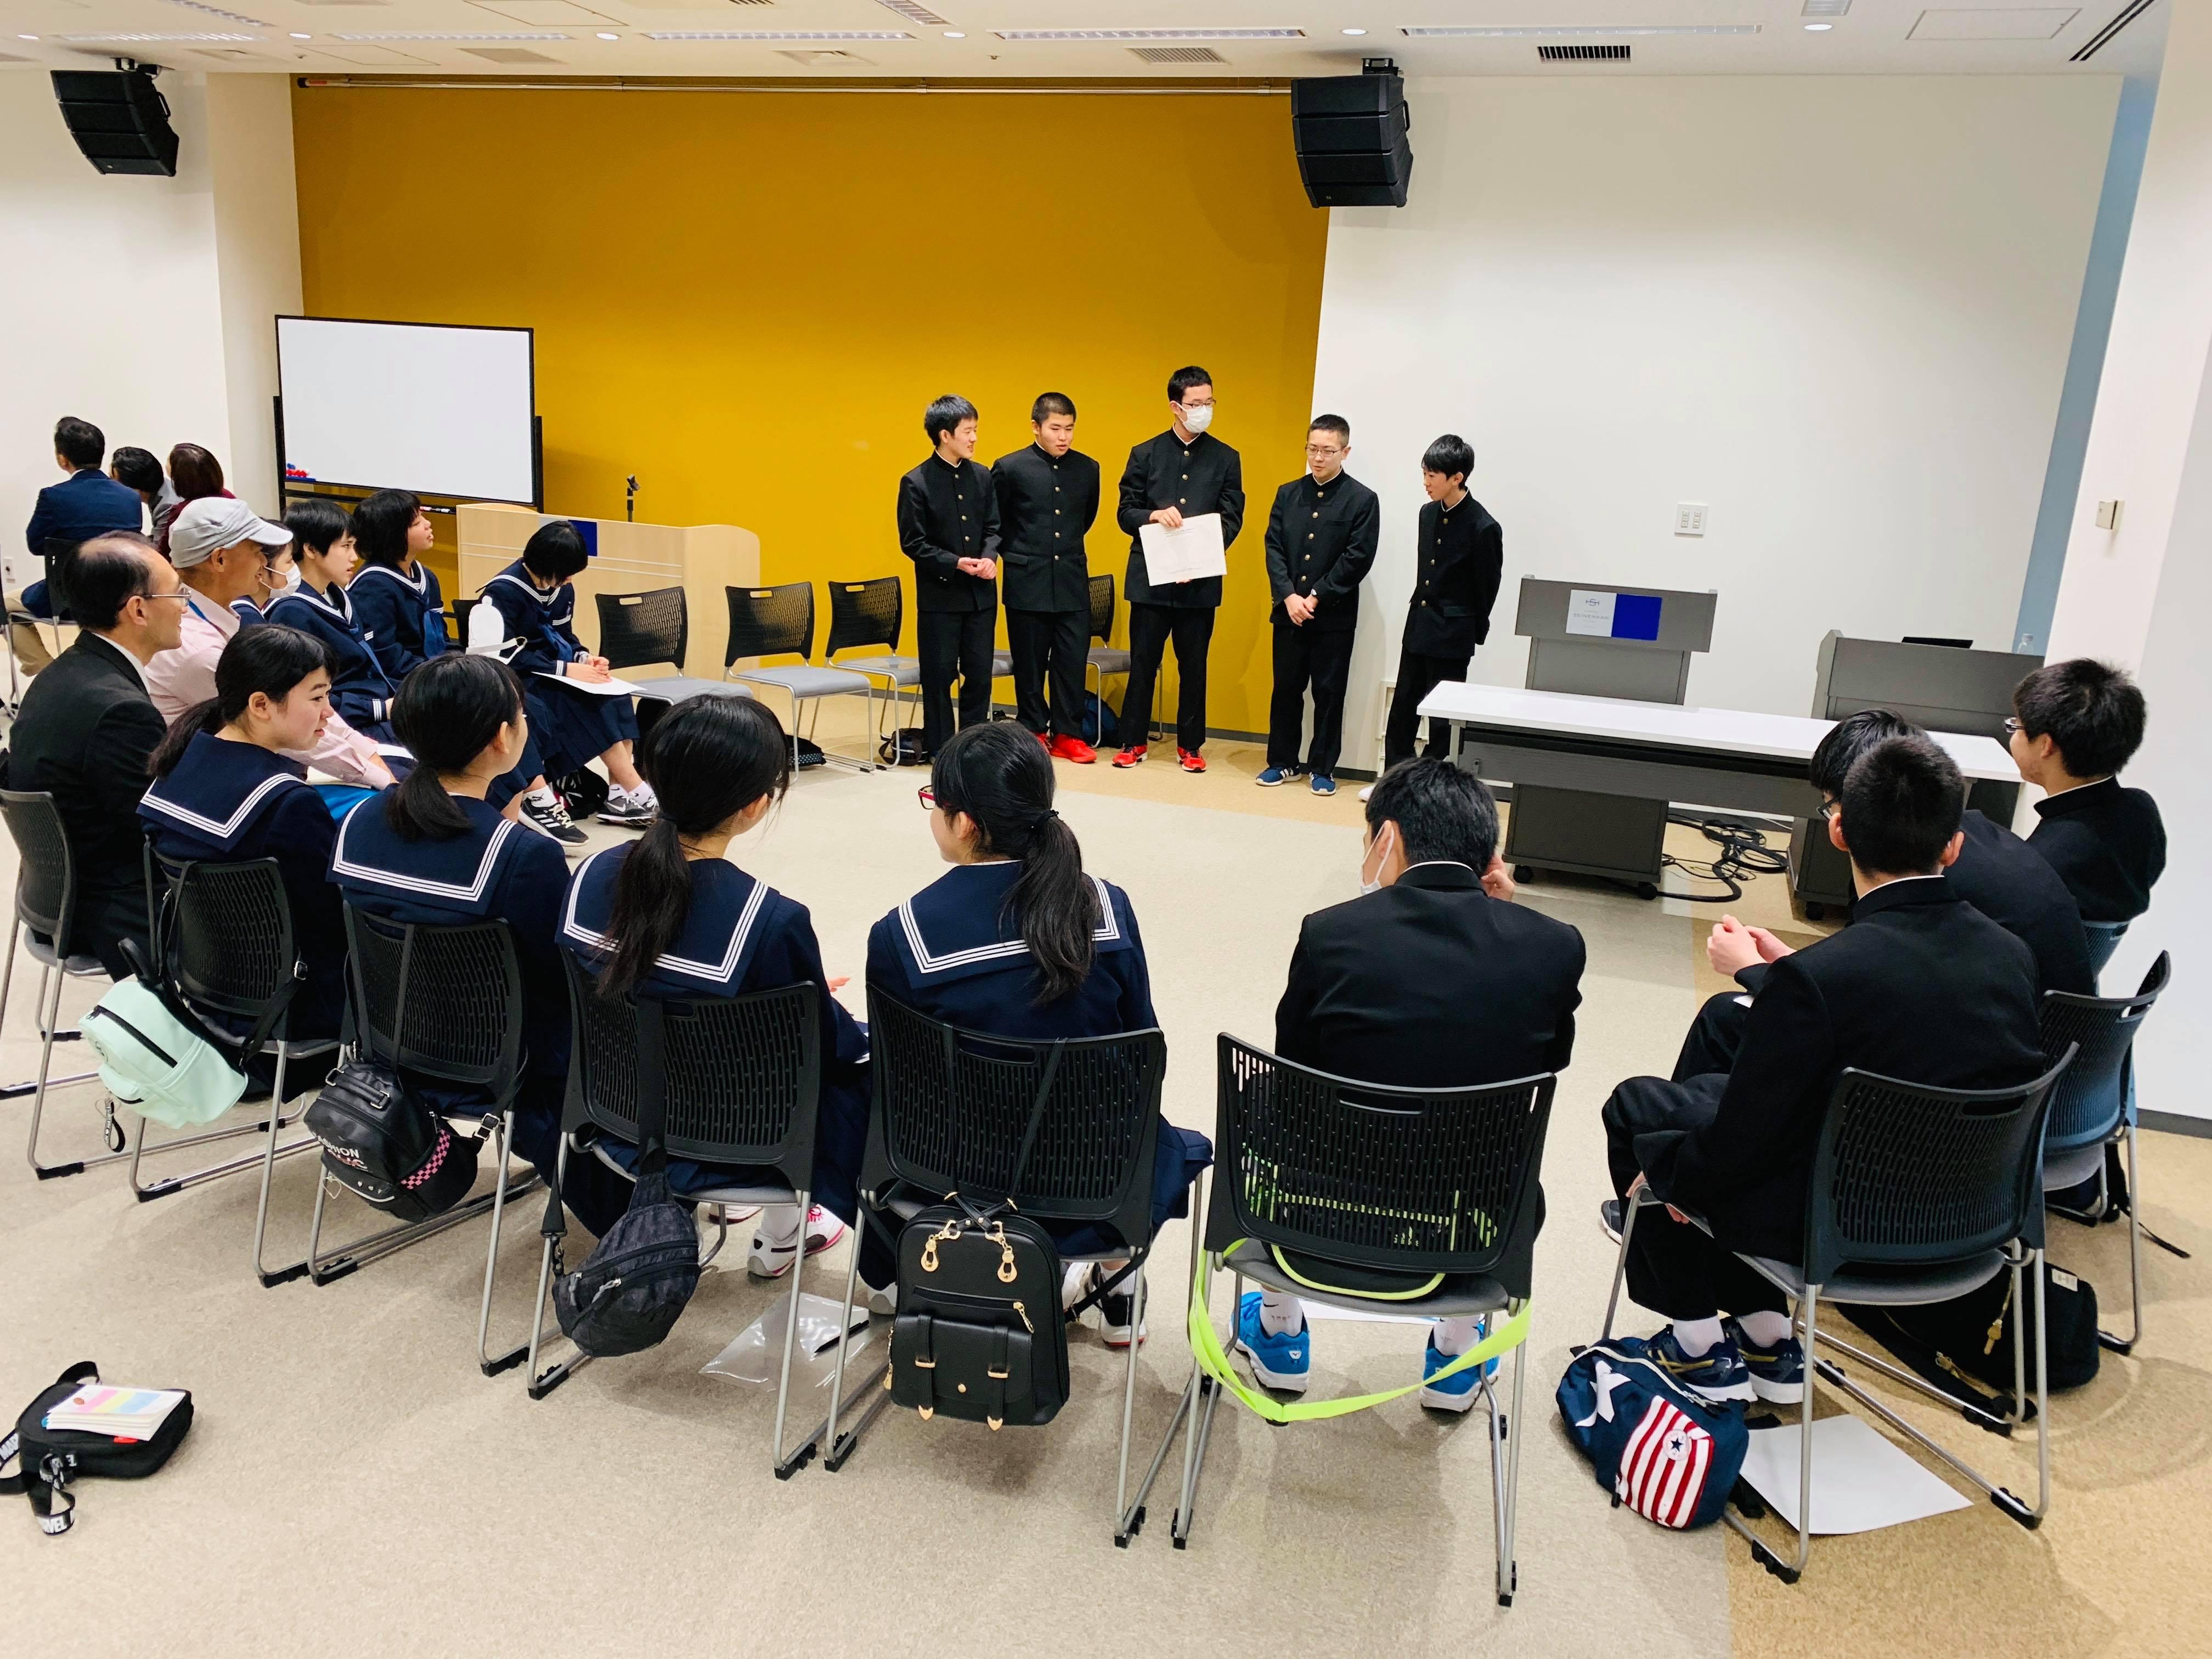 45721845 323939115068395 1734054726061785088 n - 2018年11月7日青森県東北中学校AFS(AOsukiフューチャーズゼミ)開催しました。